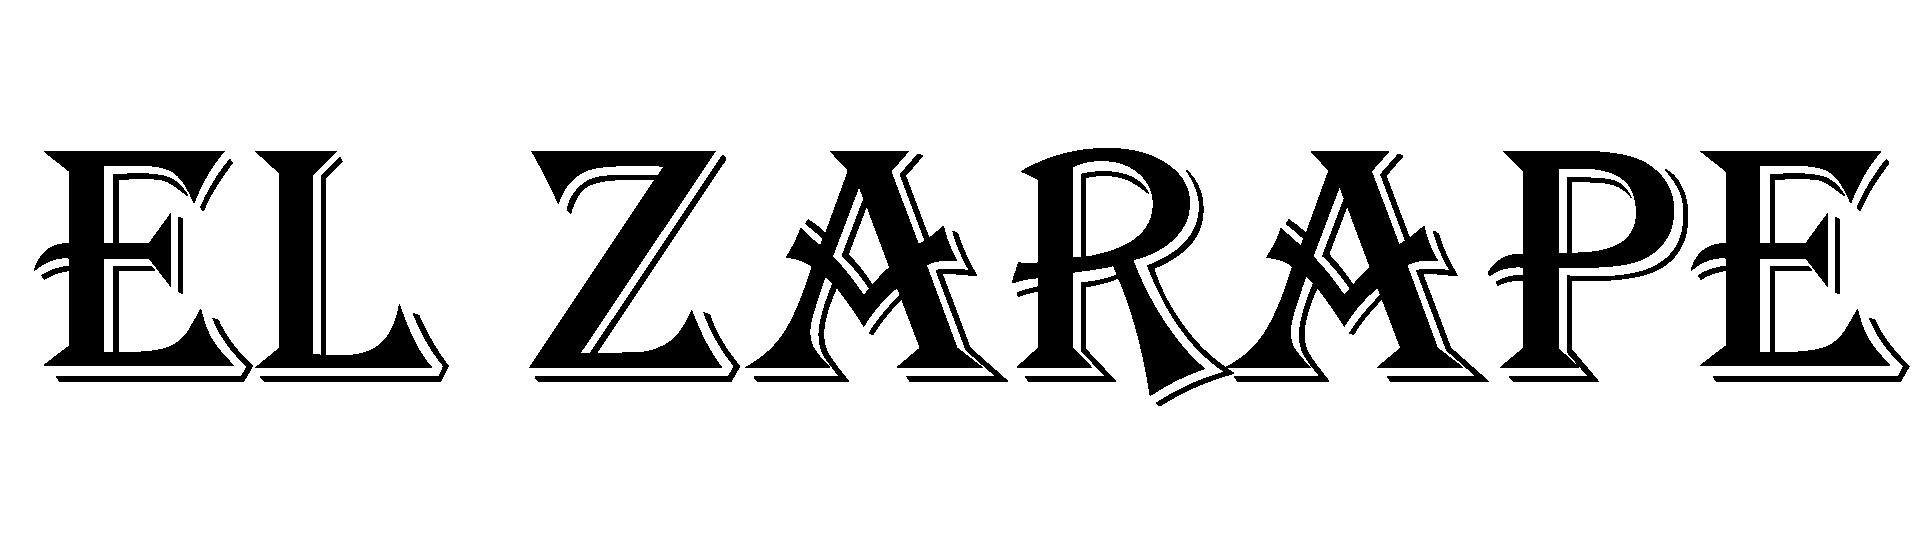 El Zarape Logo - Typesetting - Black